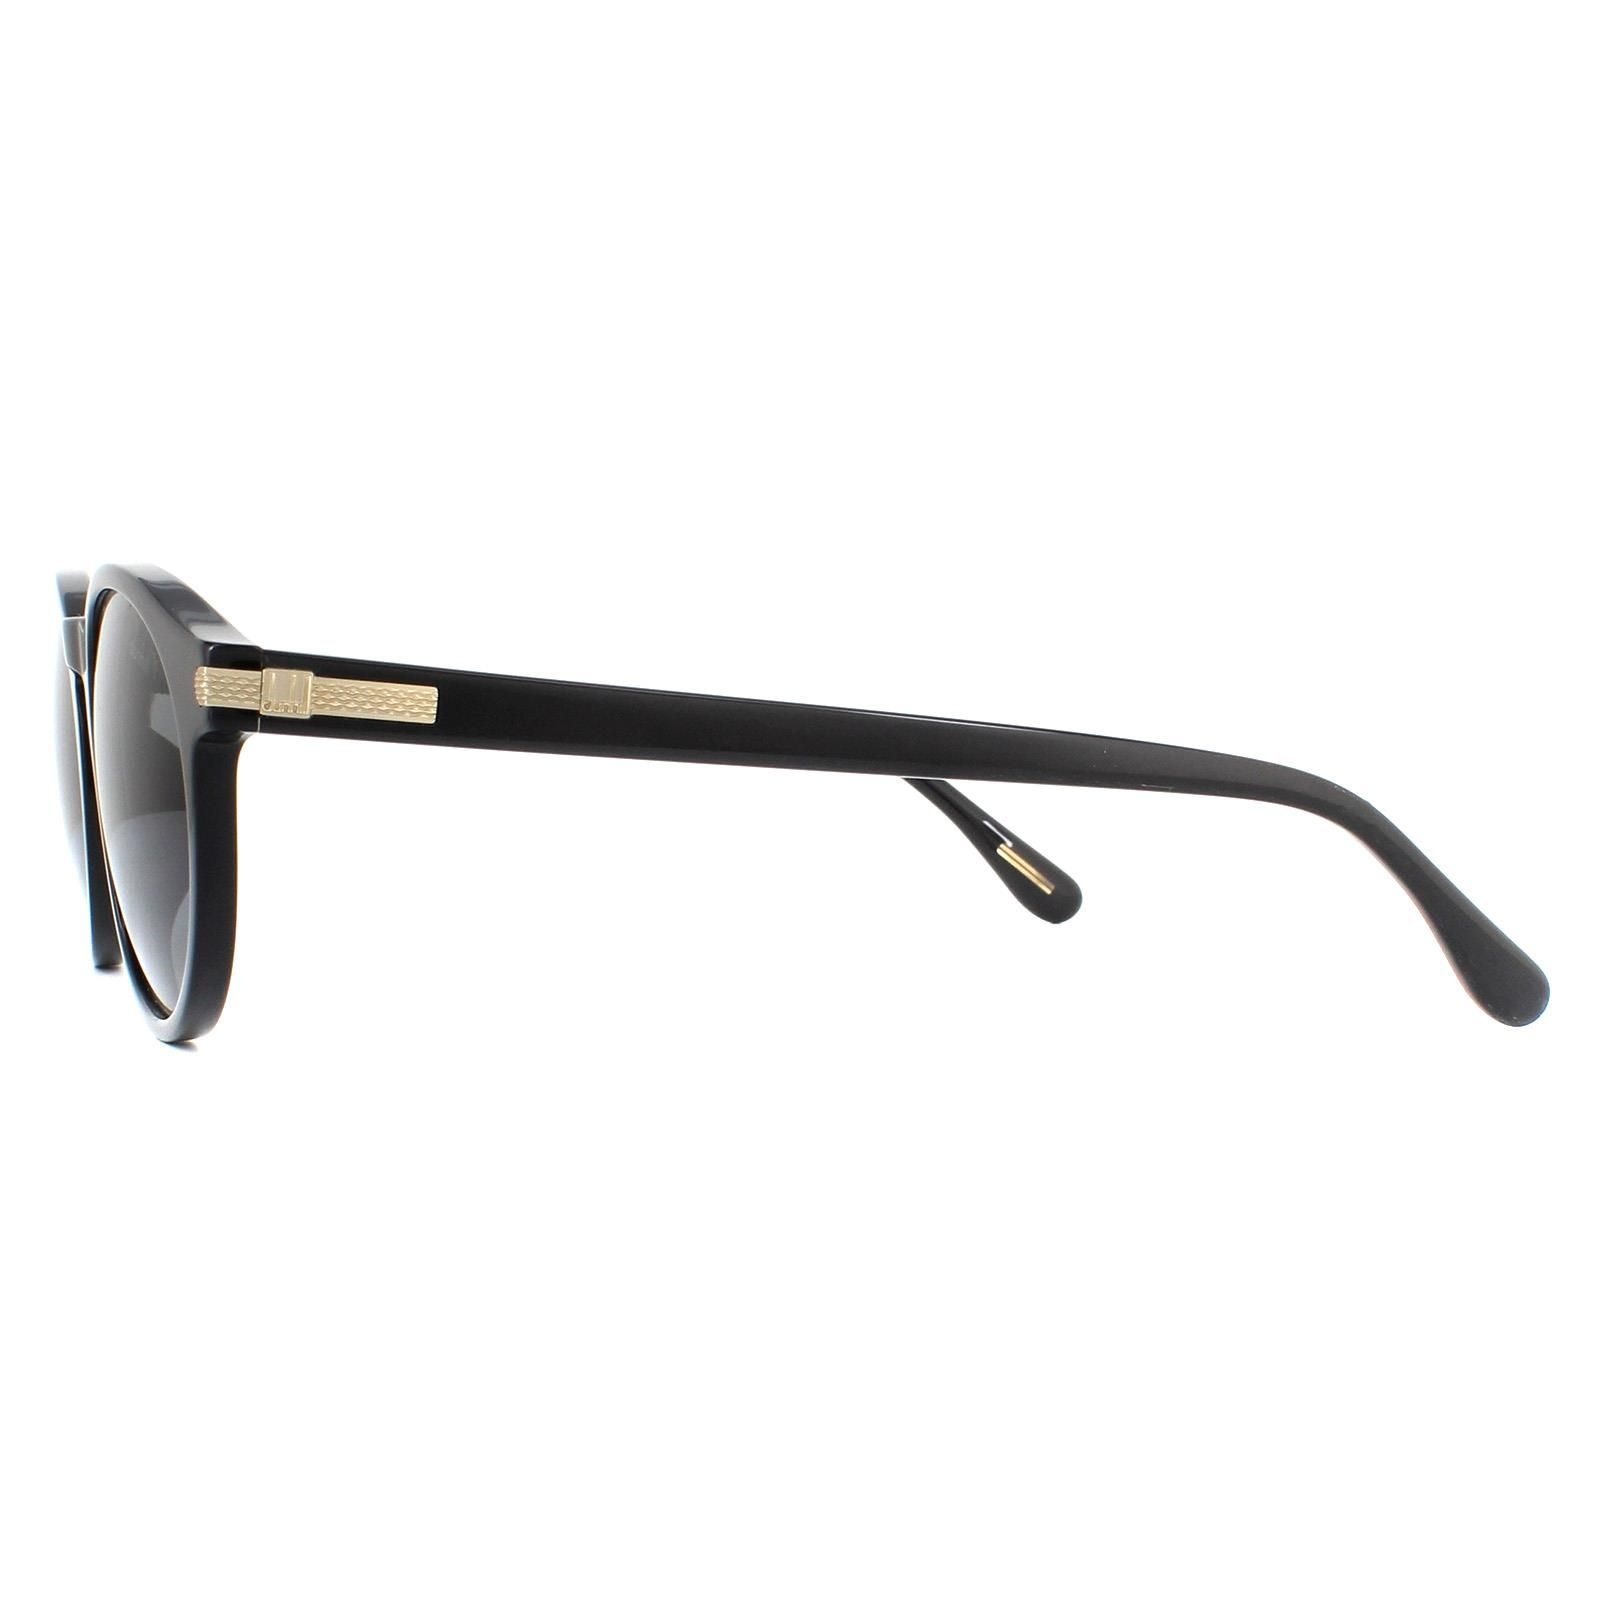 Dunhill Sunglasses SDH195M 700P Shiny Black Smoke Grey Polarized